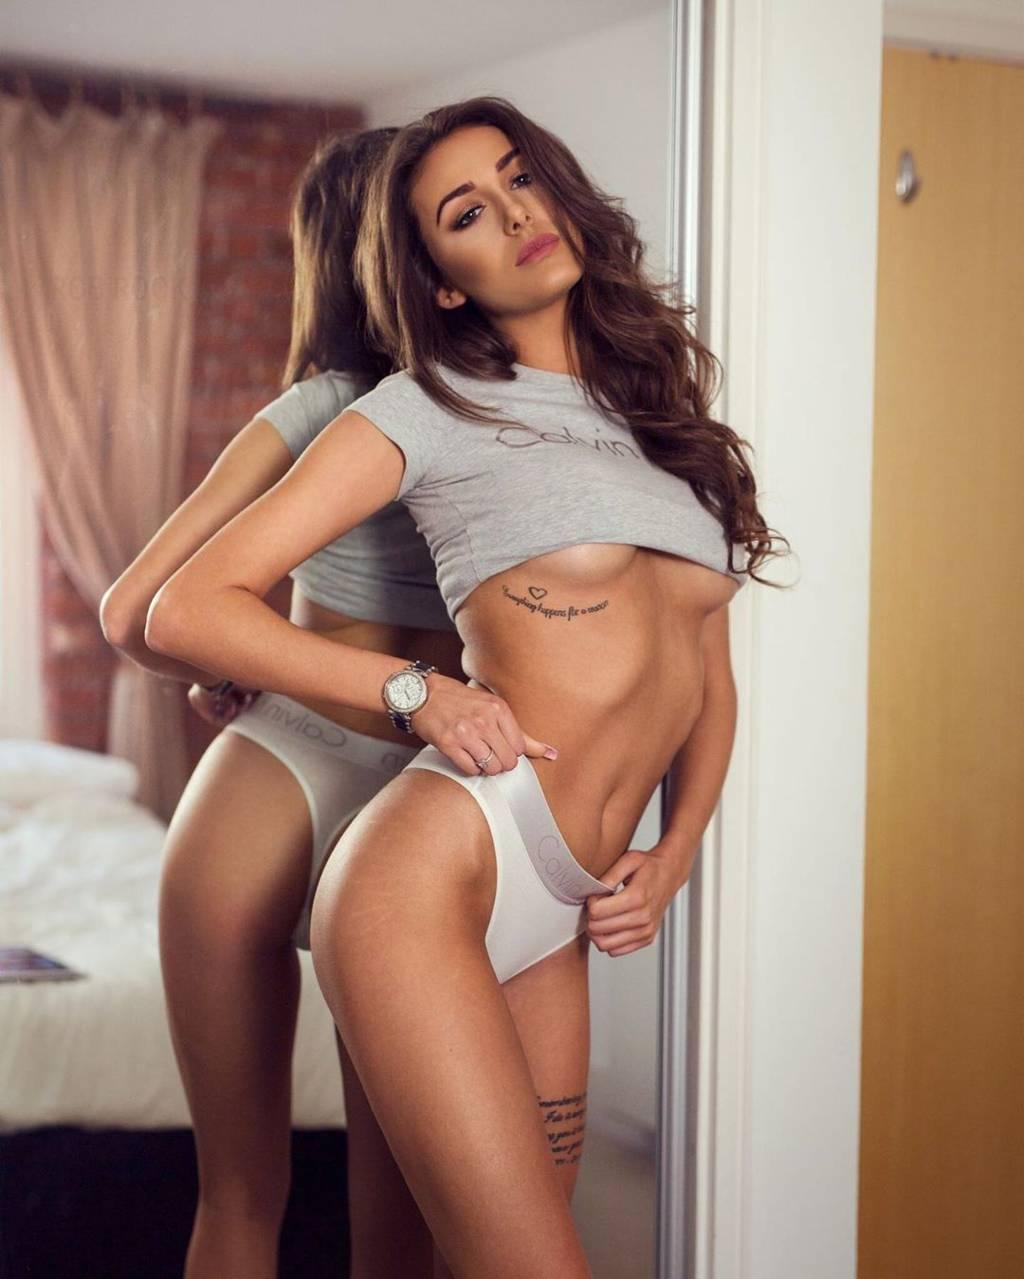 Chloe Veitch Nude photo 23